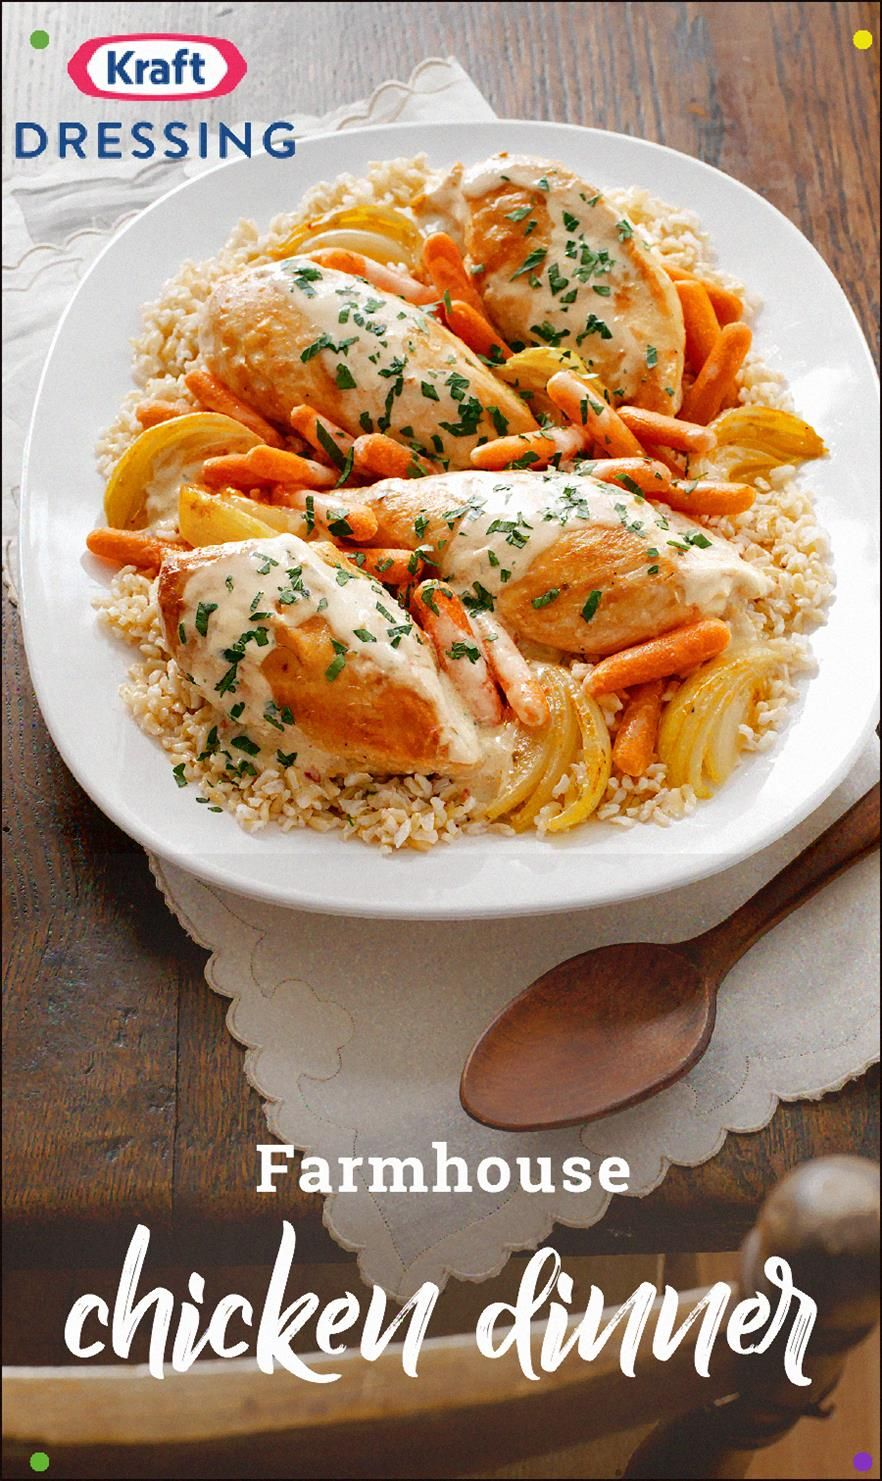 Farmhouse chicken dinner surprise everyone around your